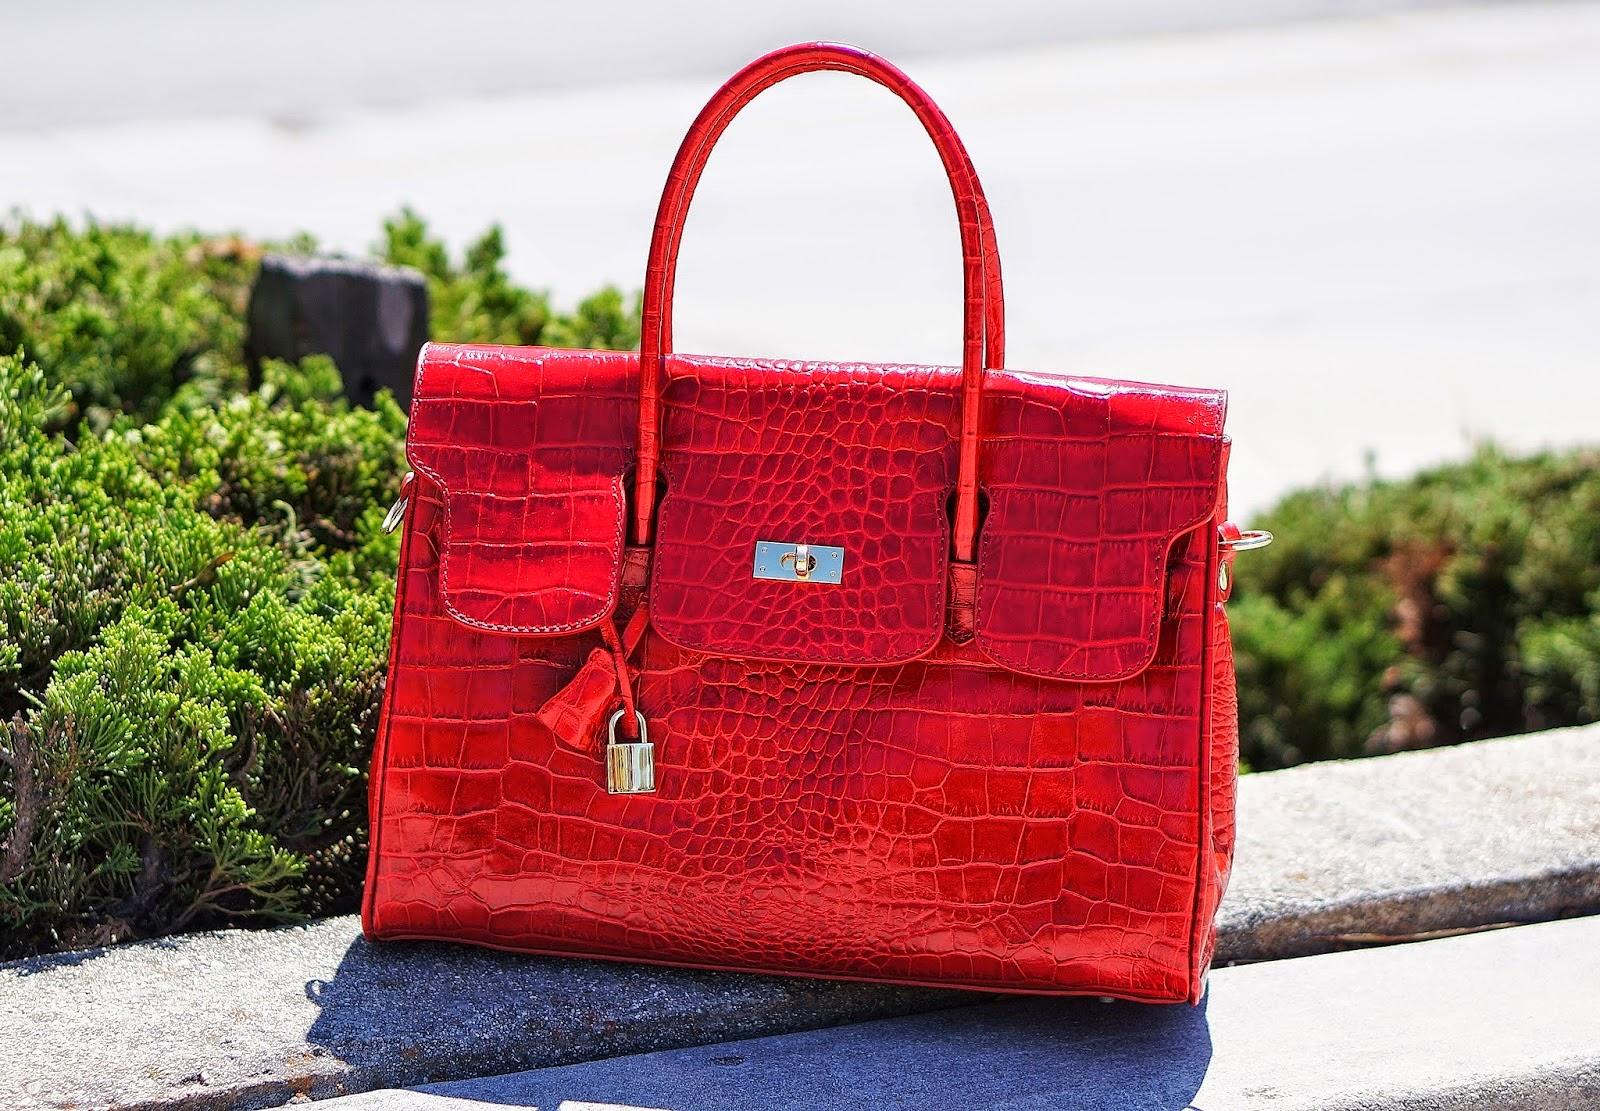 Vanilla Paris Bertie Bag